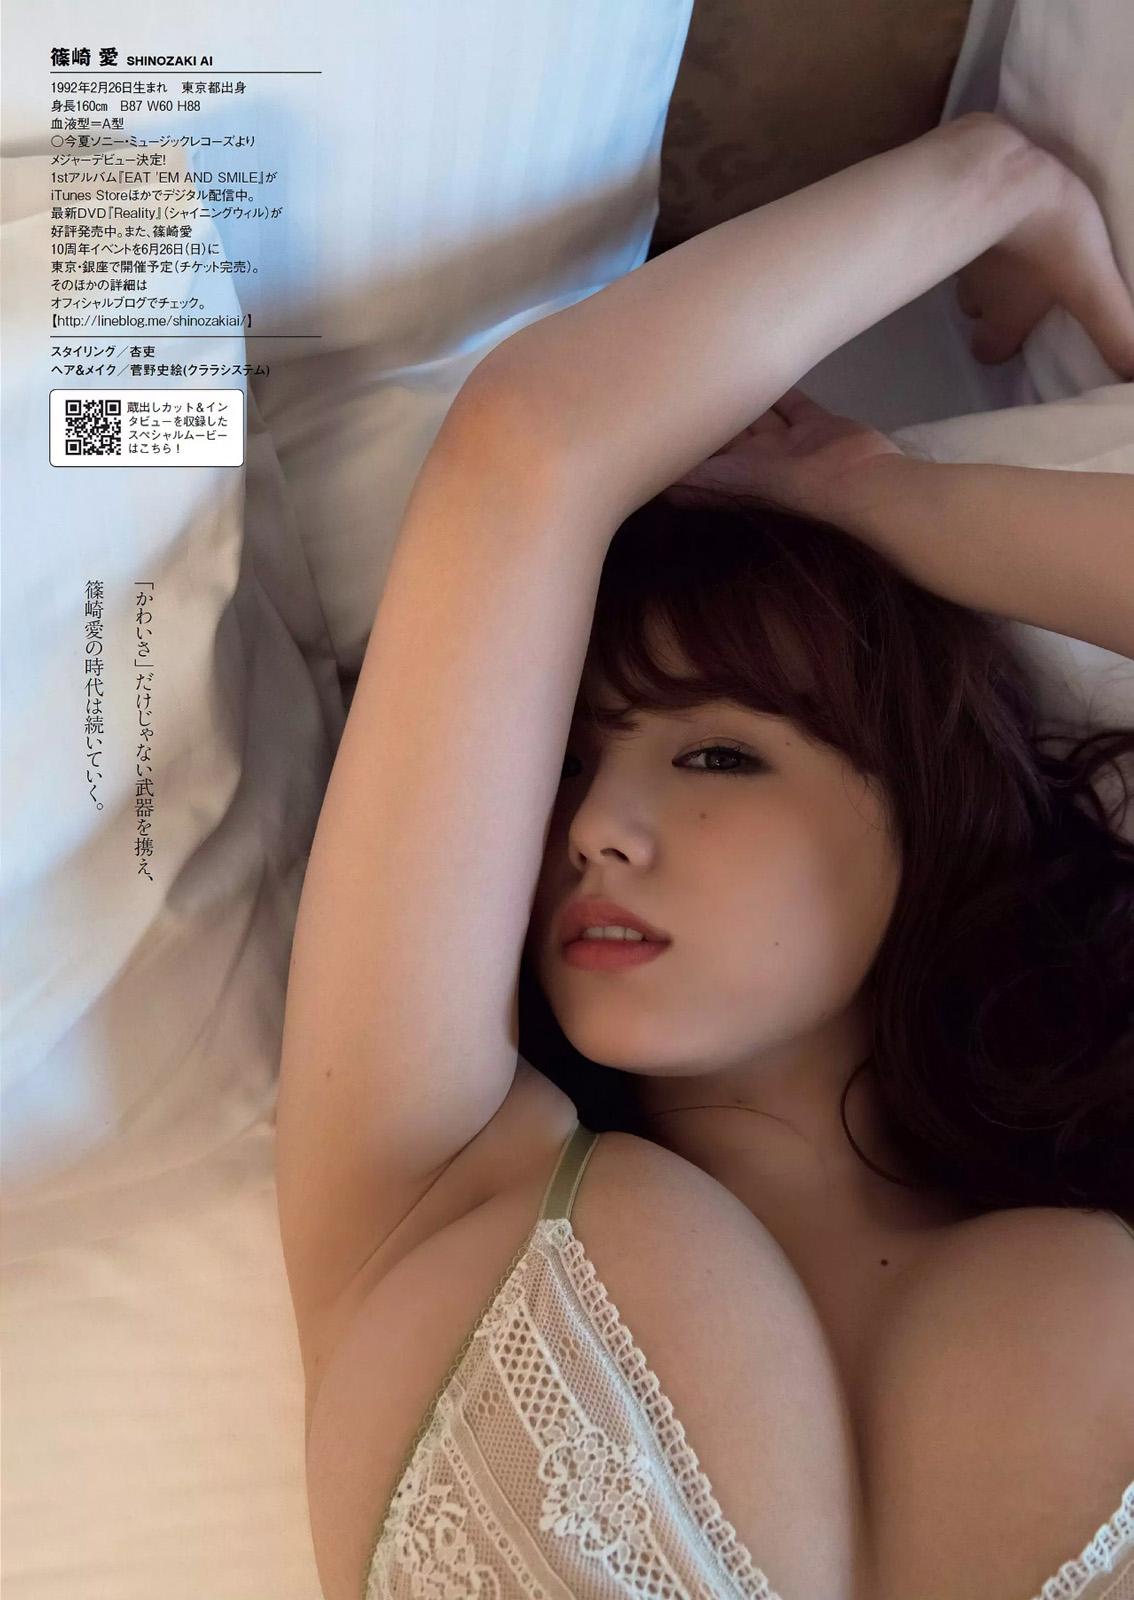 image http://scanlover.com/assets/images/414-bu39xAvZZZ0nk8Bm.jpeg